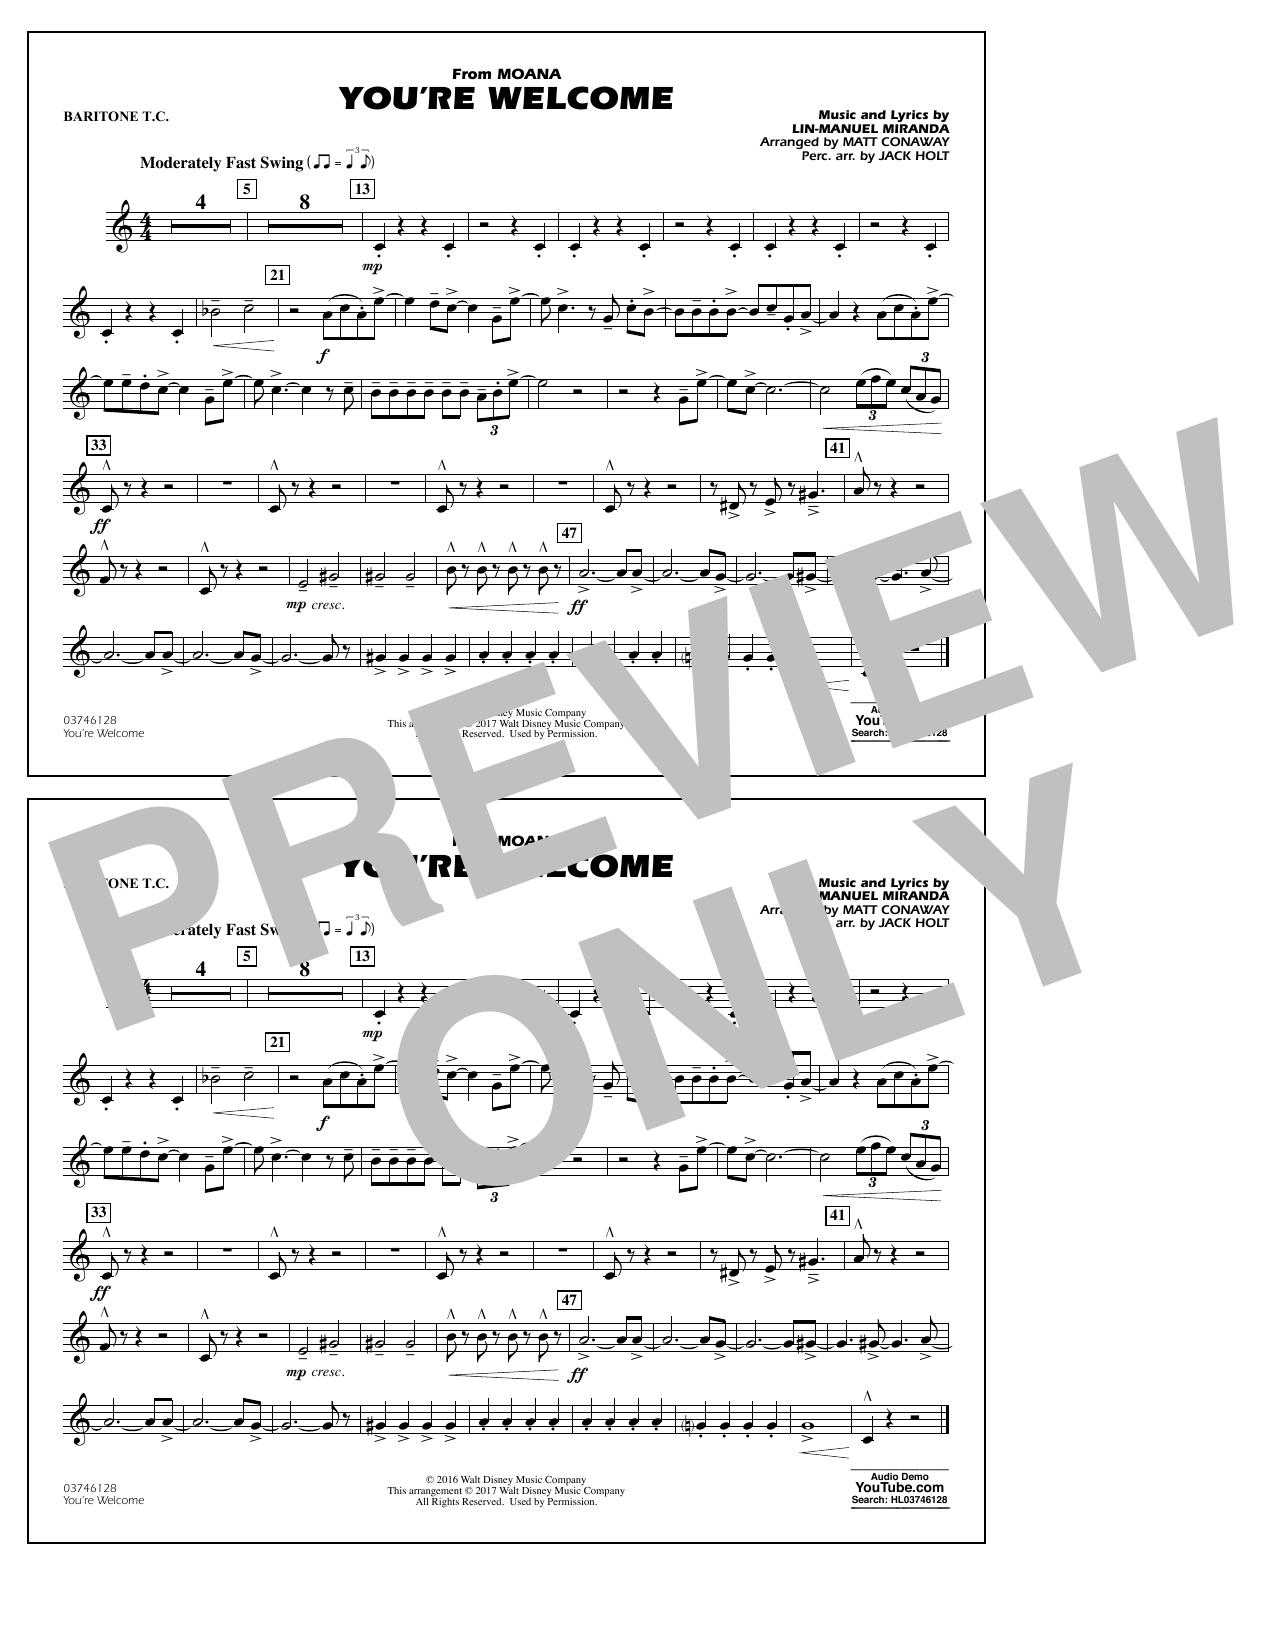 You're Welcome (from Moana) - Baritone T.C. Sheet Music